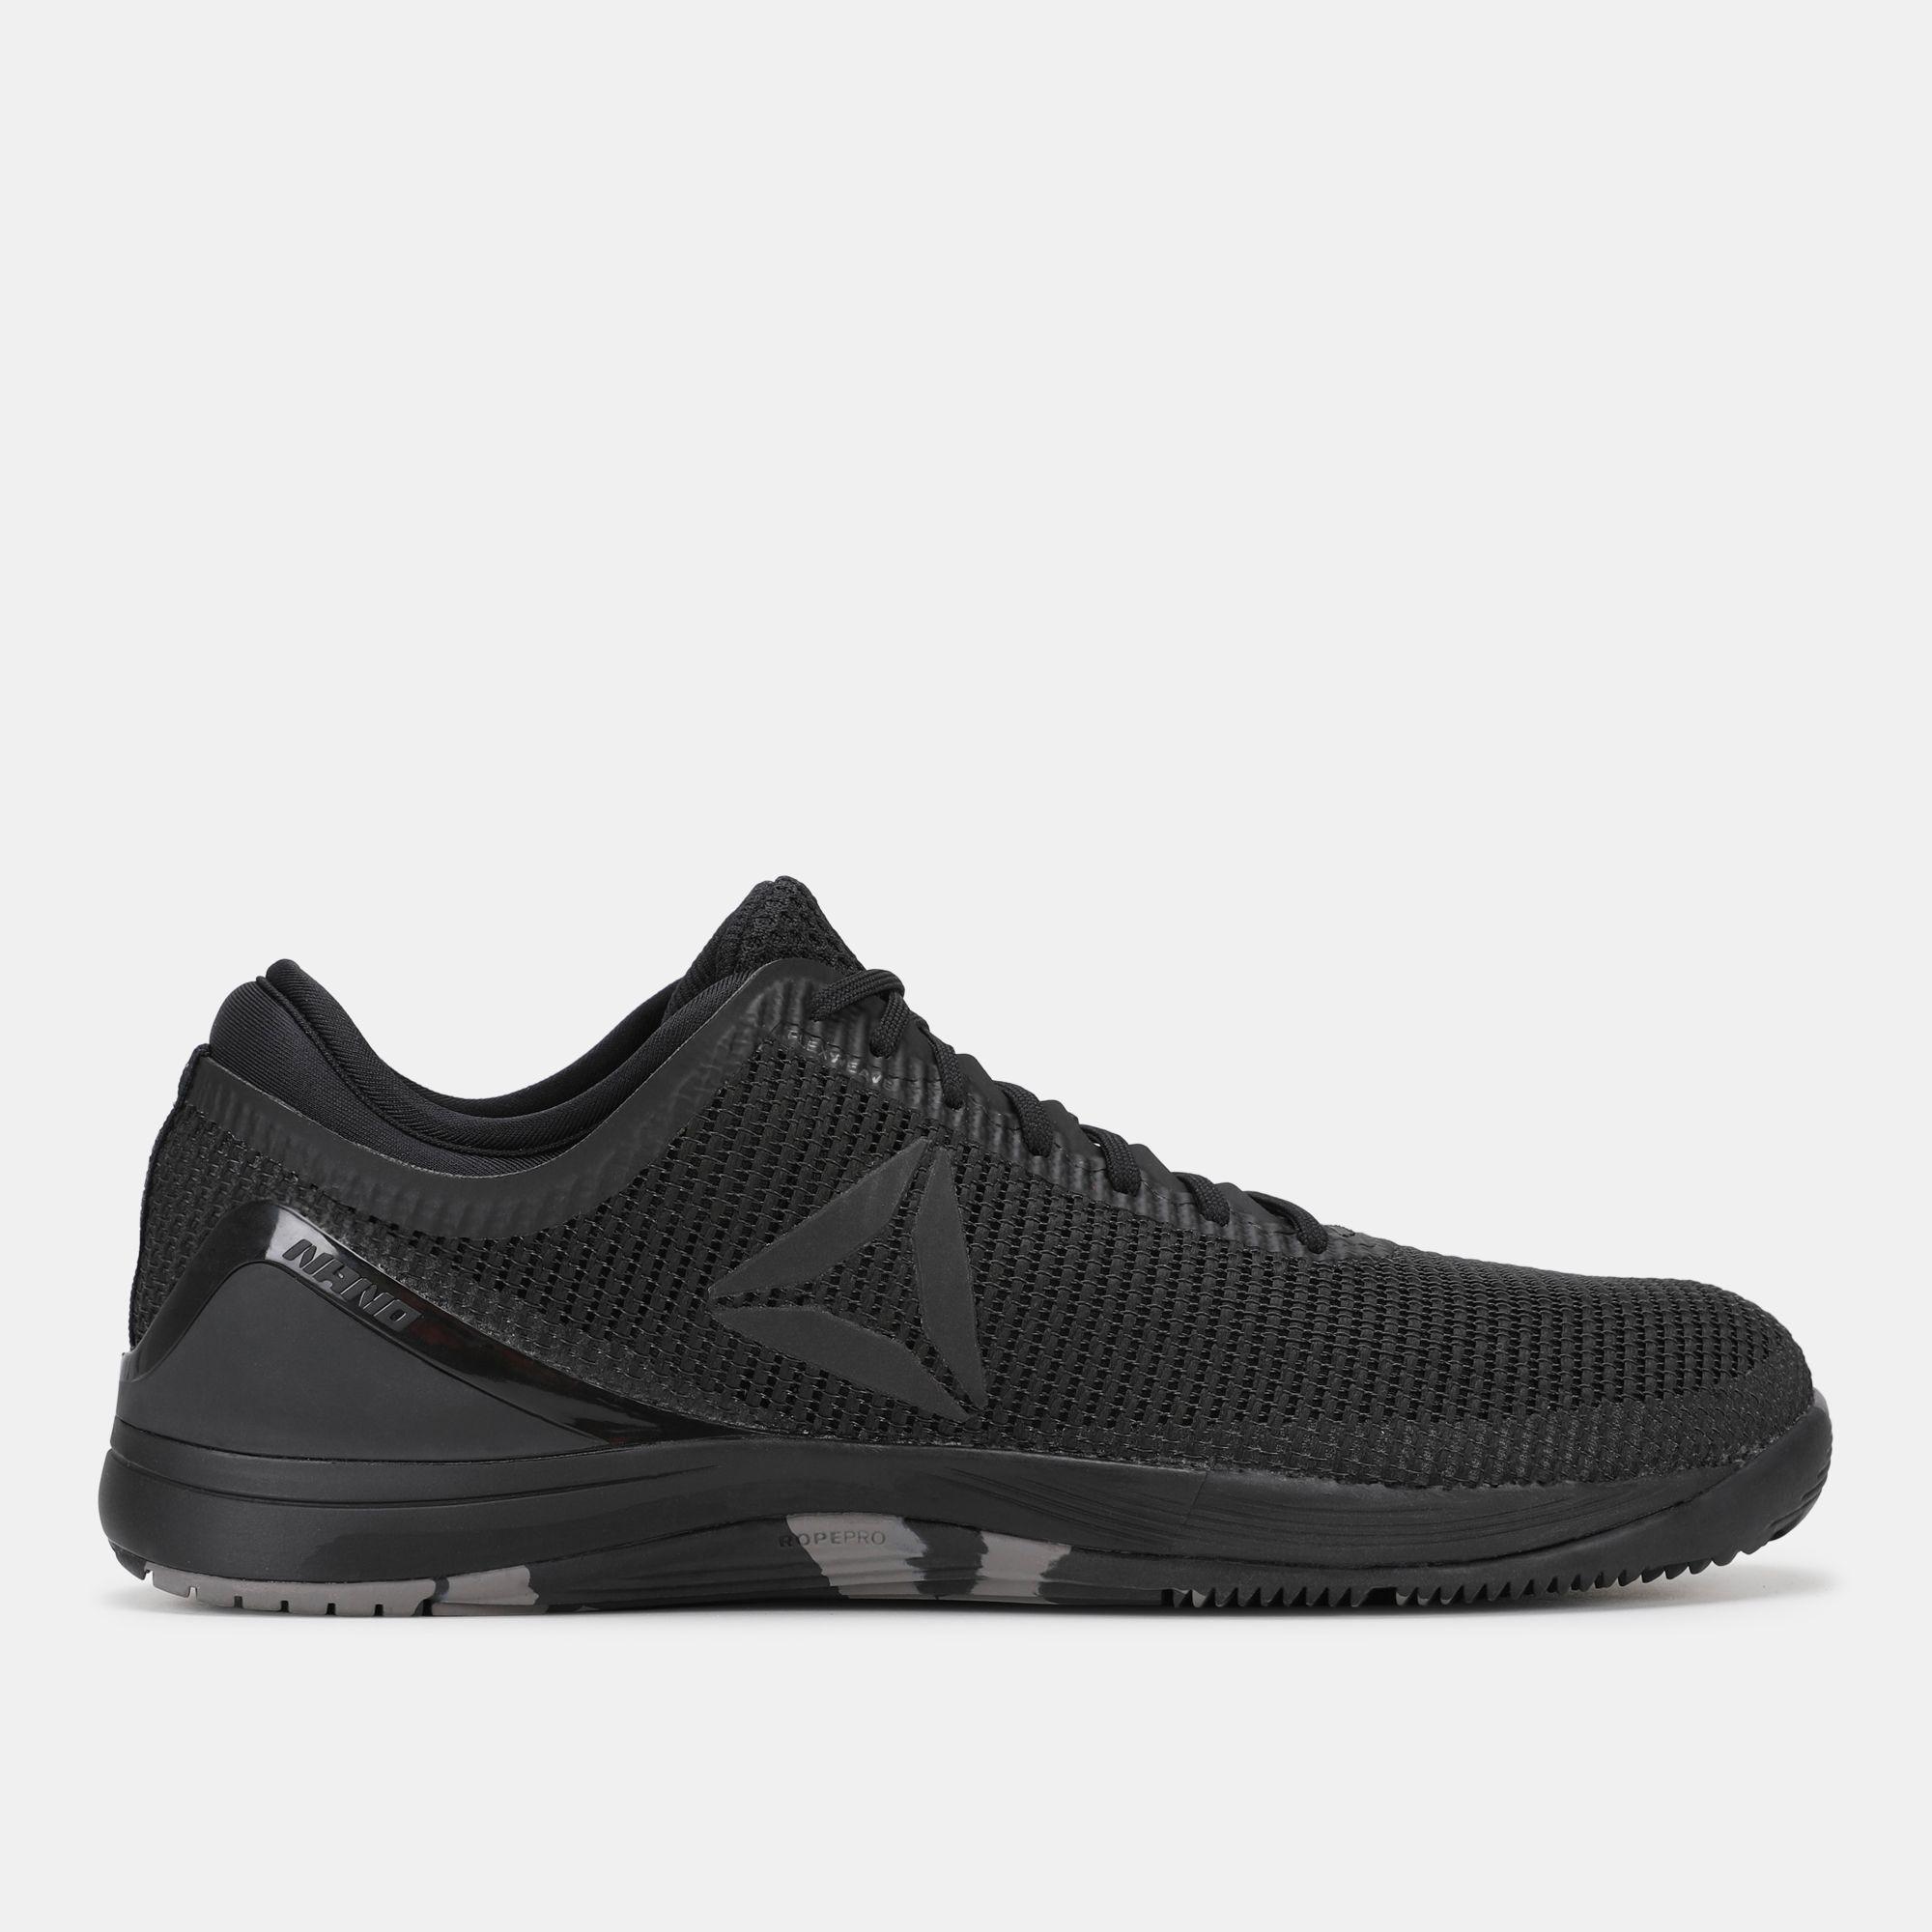 5a074ad9e49 Reebok Crossfit Nano 8 Flexweave Shoe | Sports Shoes | Shoes | Men's ...